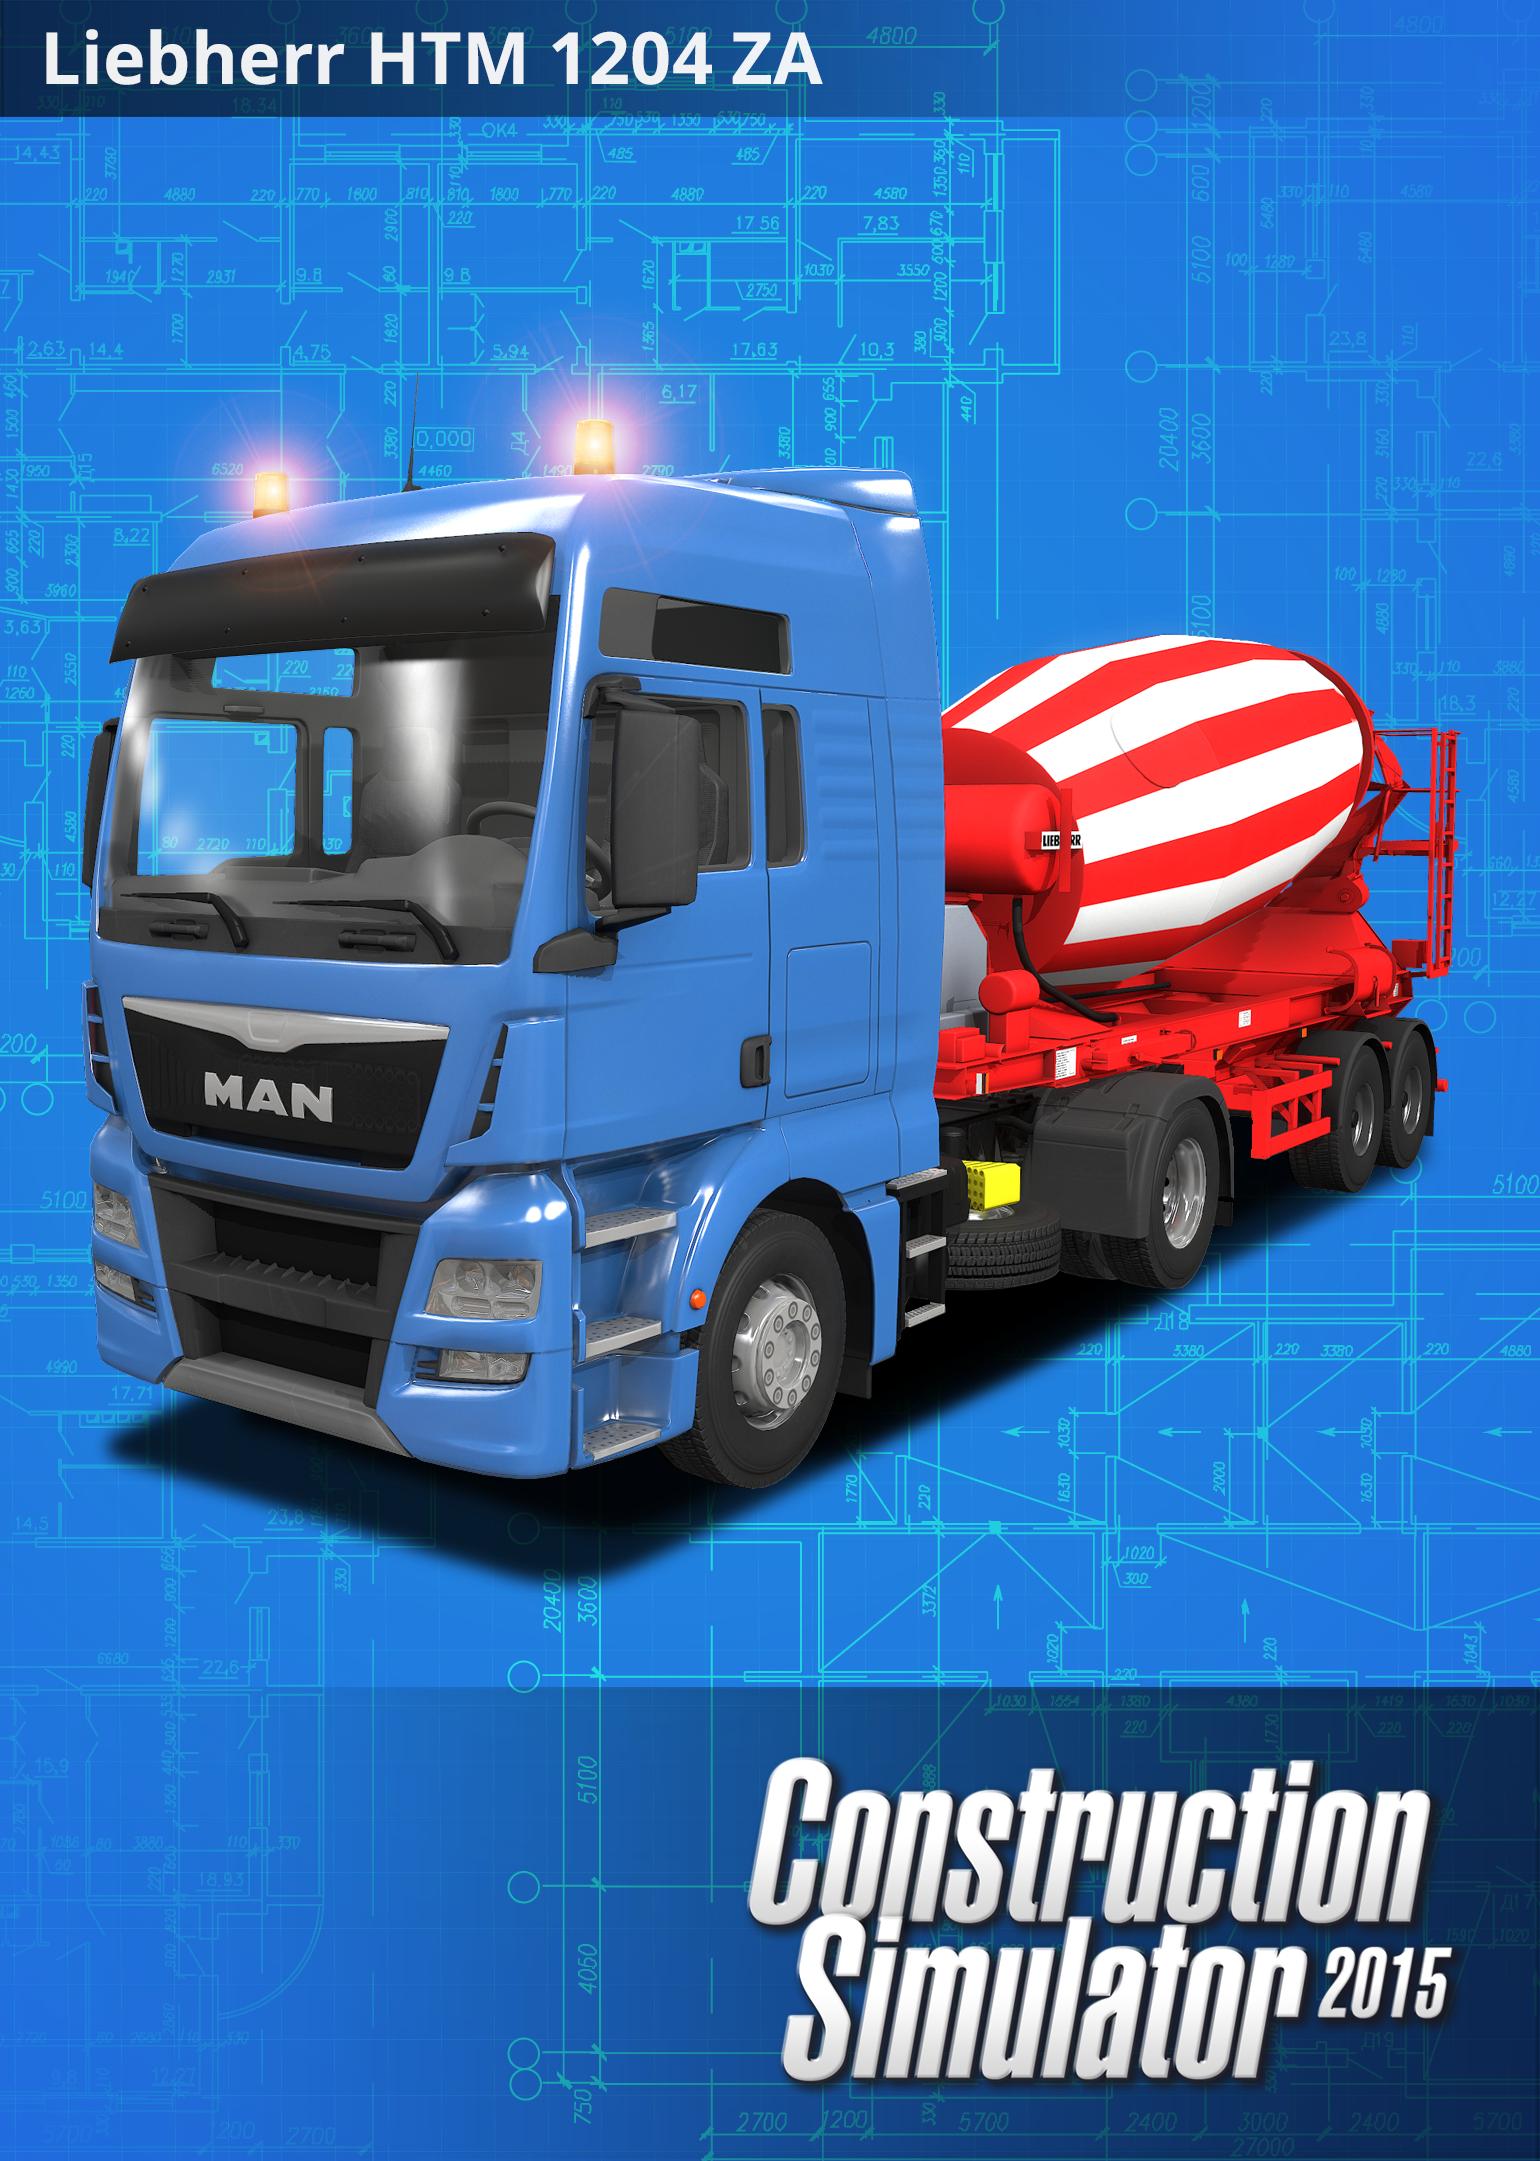 construction-simulator-2015-liebherr-htm-1204-za-code-jeu-pc-mac-steam